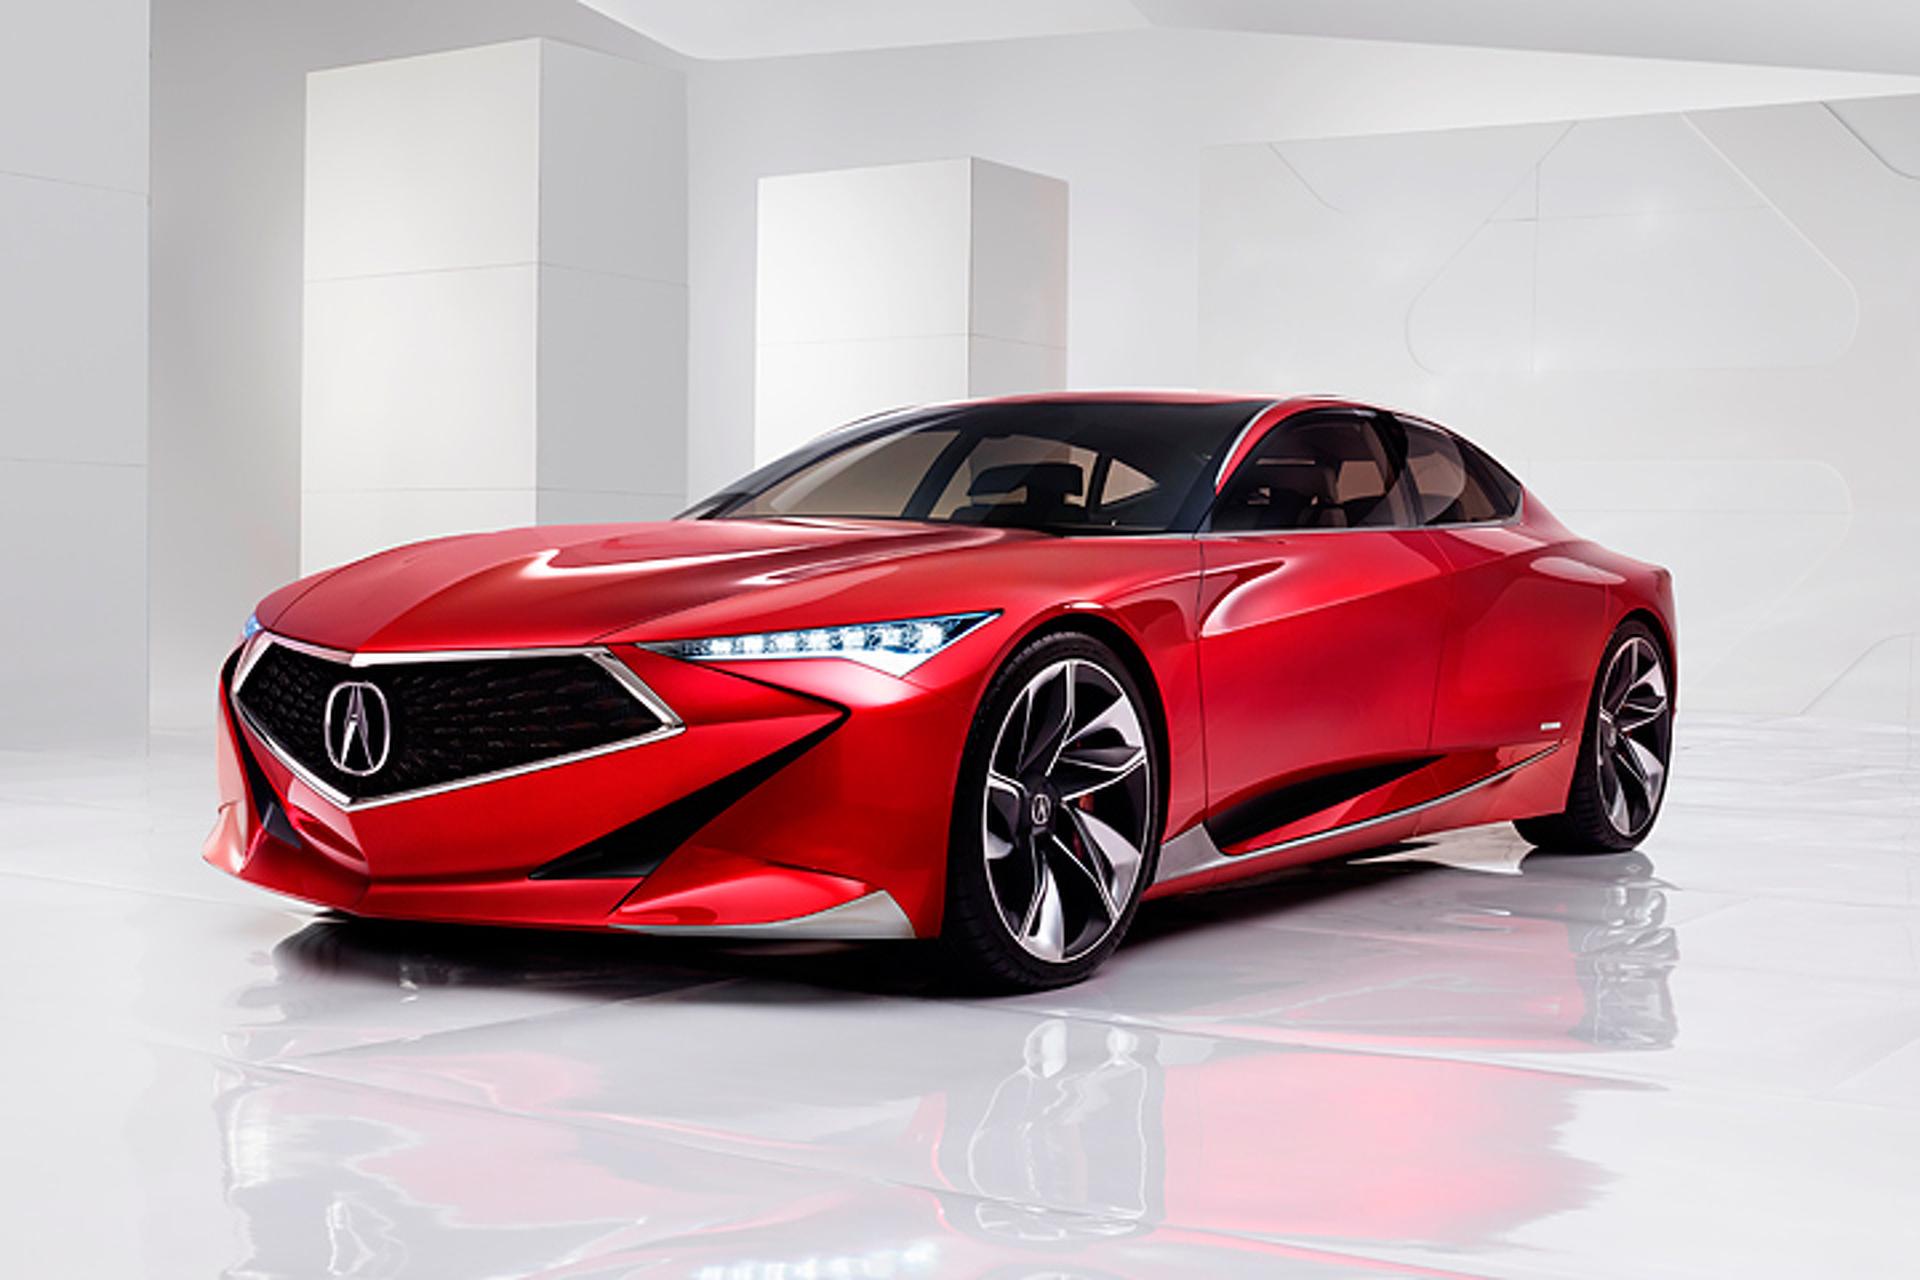 Honda S2000 2018 >> Report Says The Honda S2000 Will Return For 2018